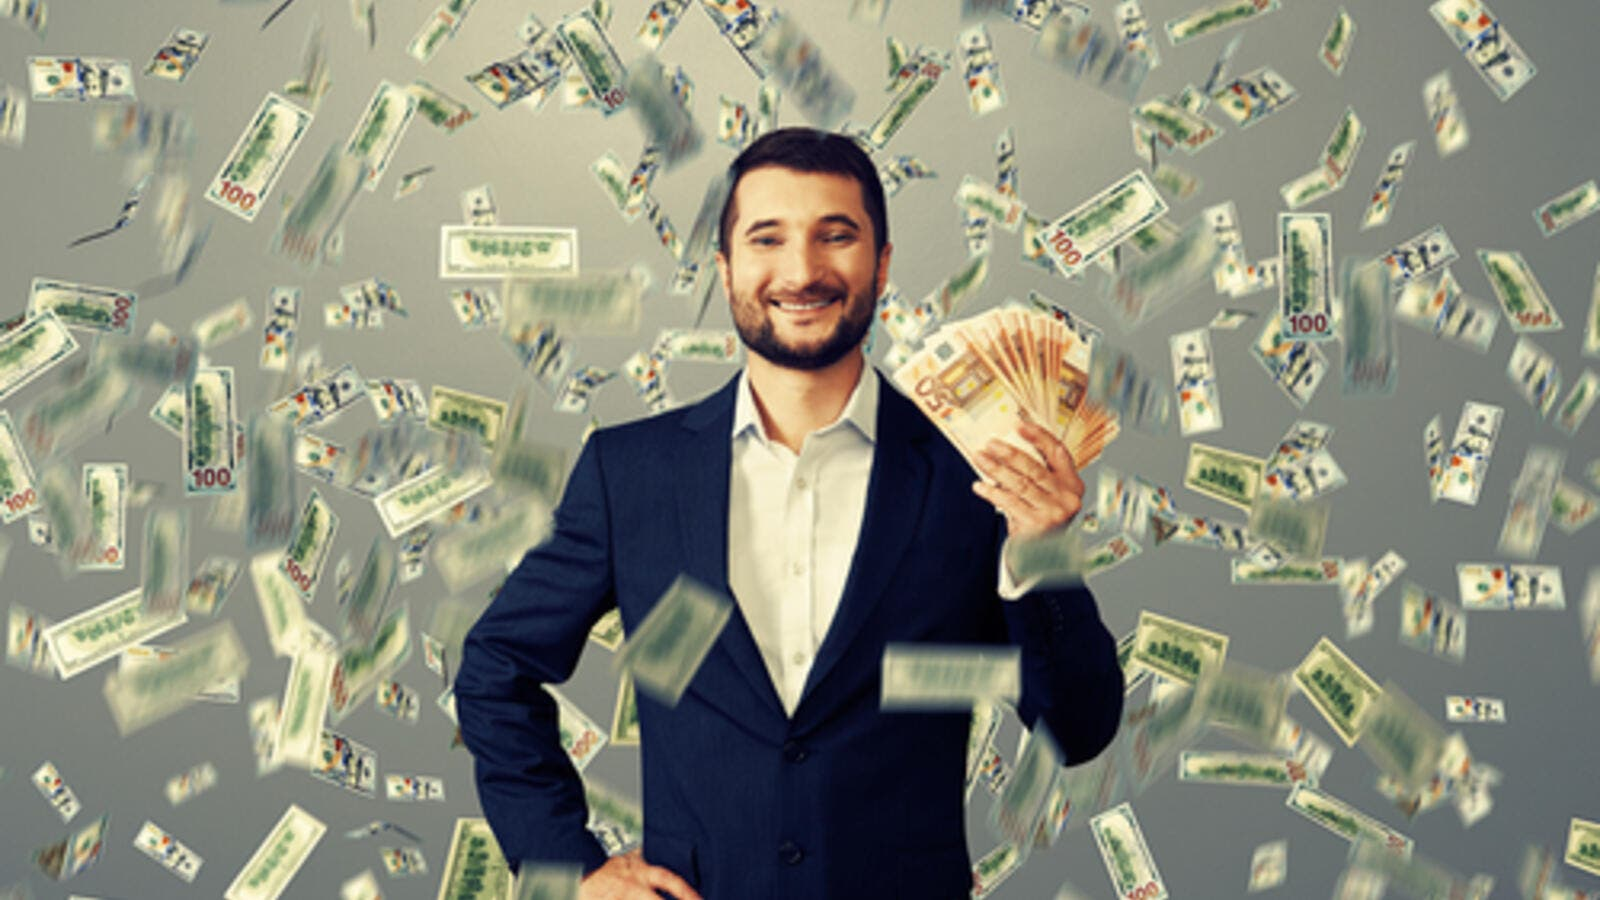 UAE Billionaire's Club: 12 residents make Forbes world's super rich